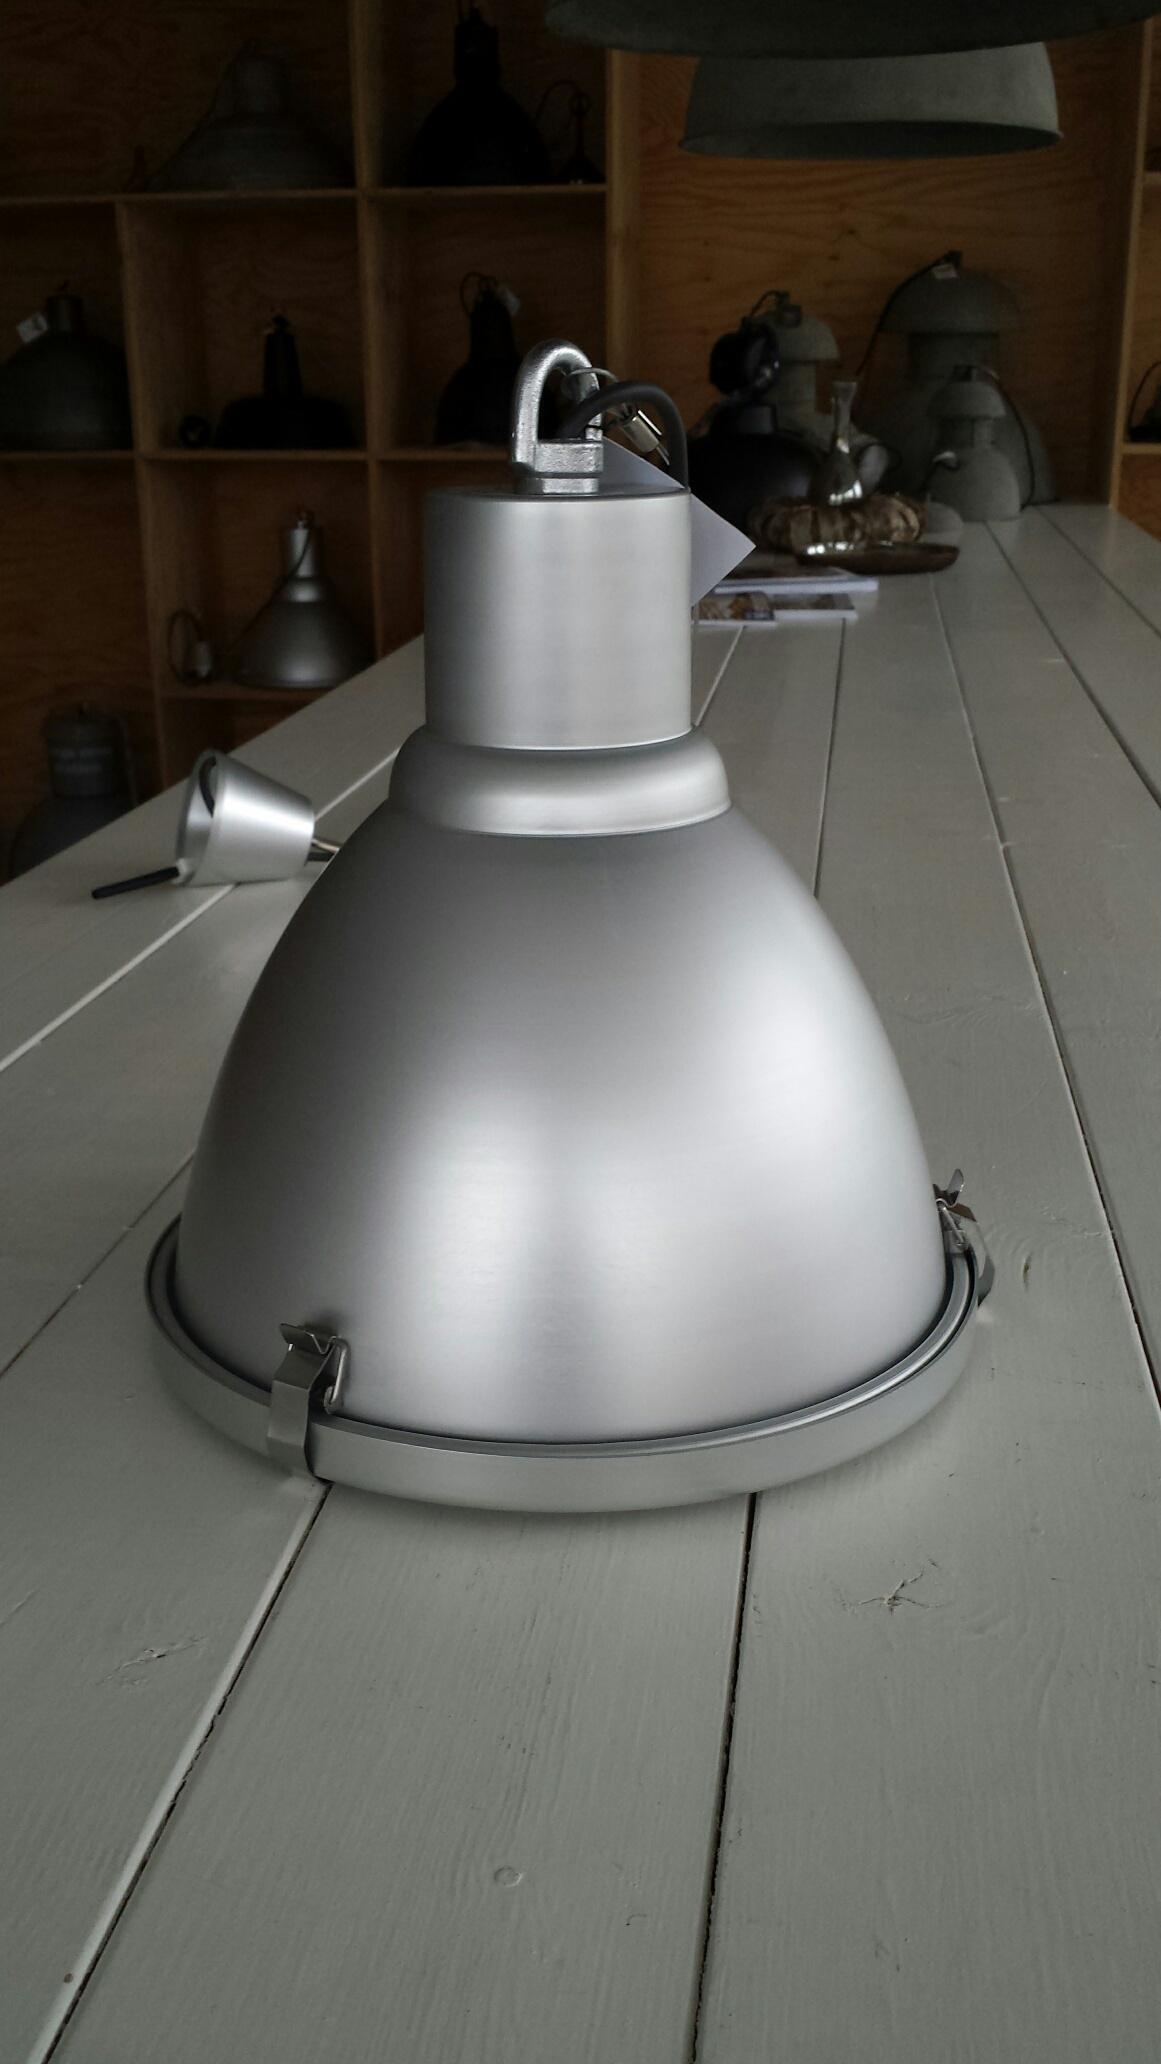 Stoere Hanglamp Keuken : > Producten > Bestsellerlampen > Aluminium Hanglamp Keuken AL-1012